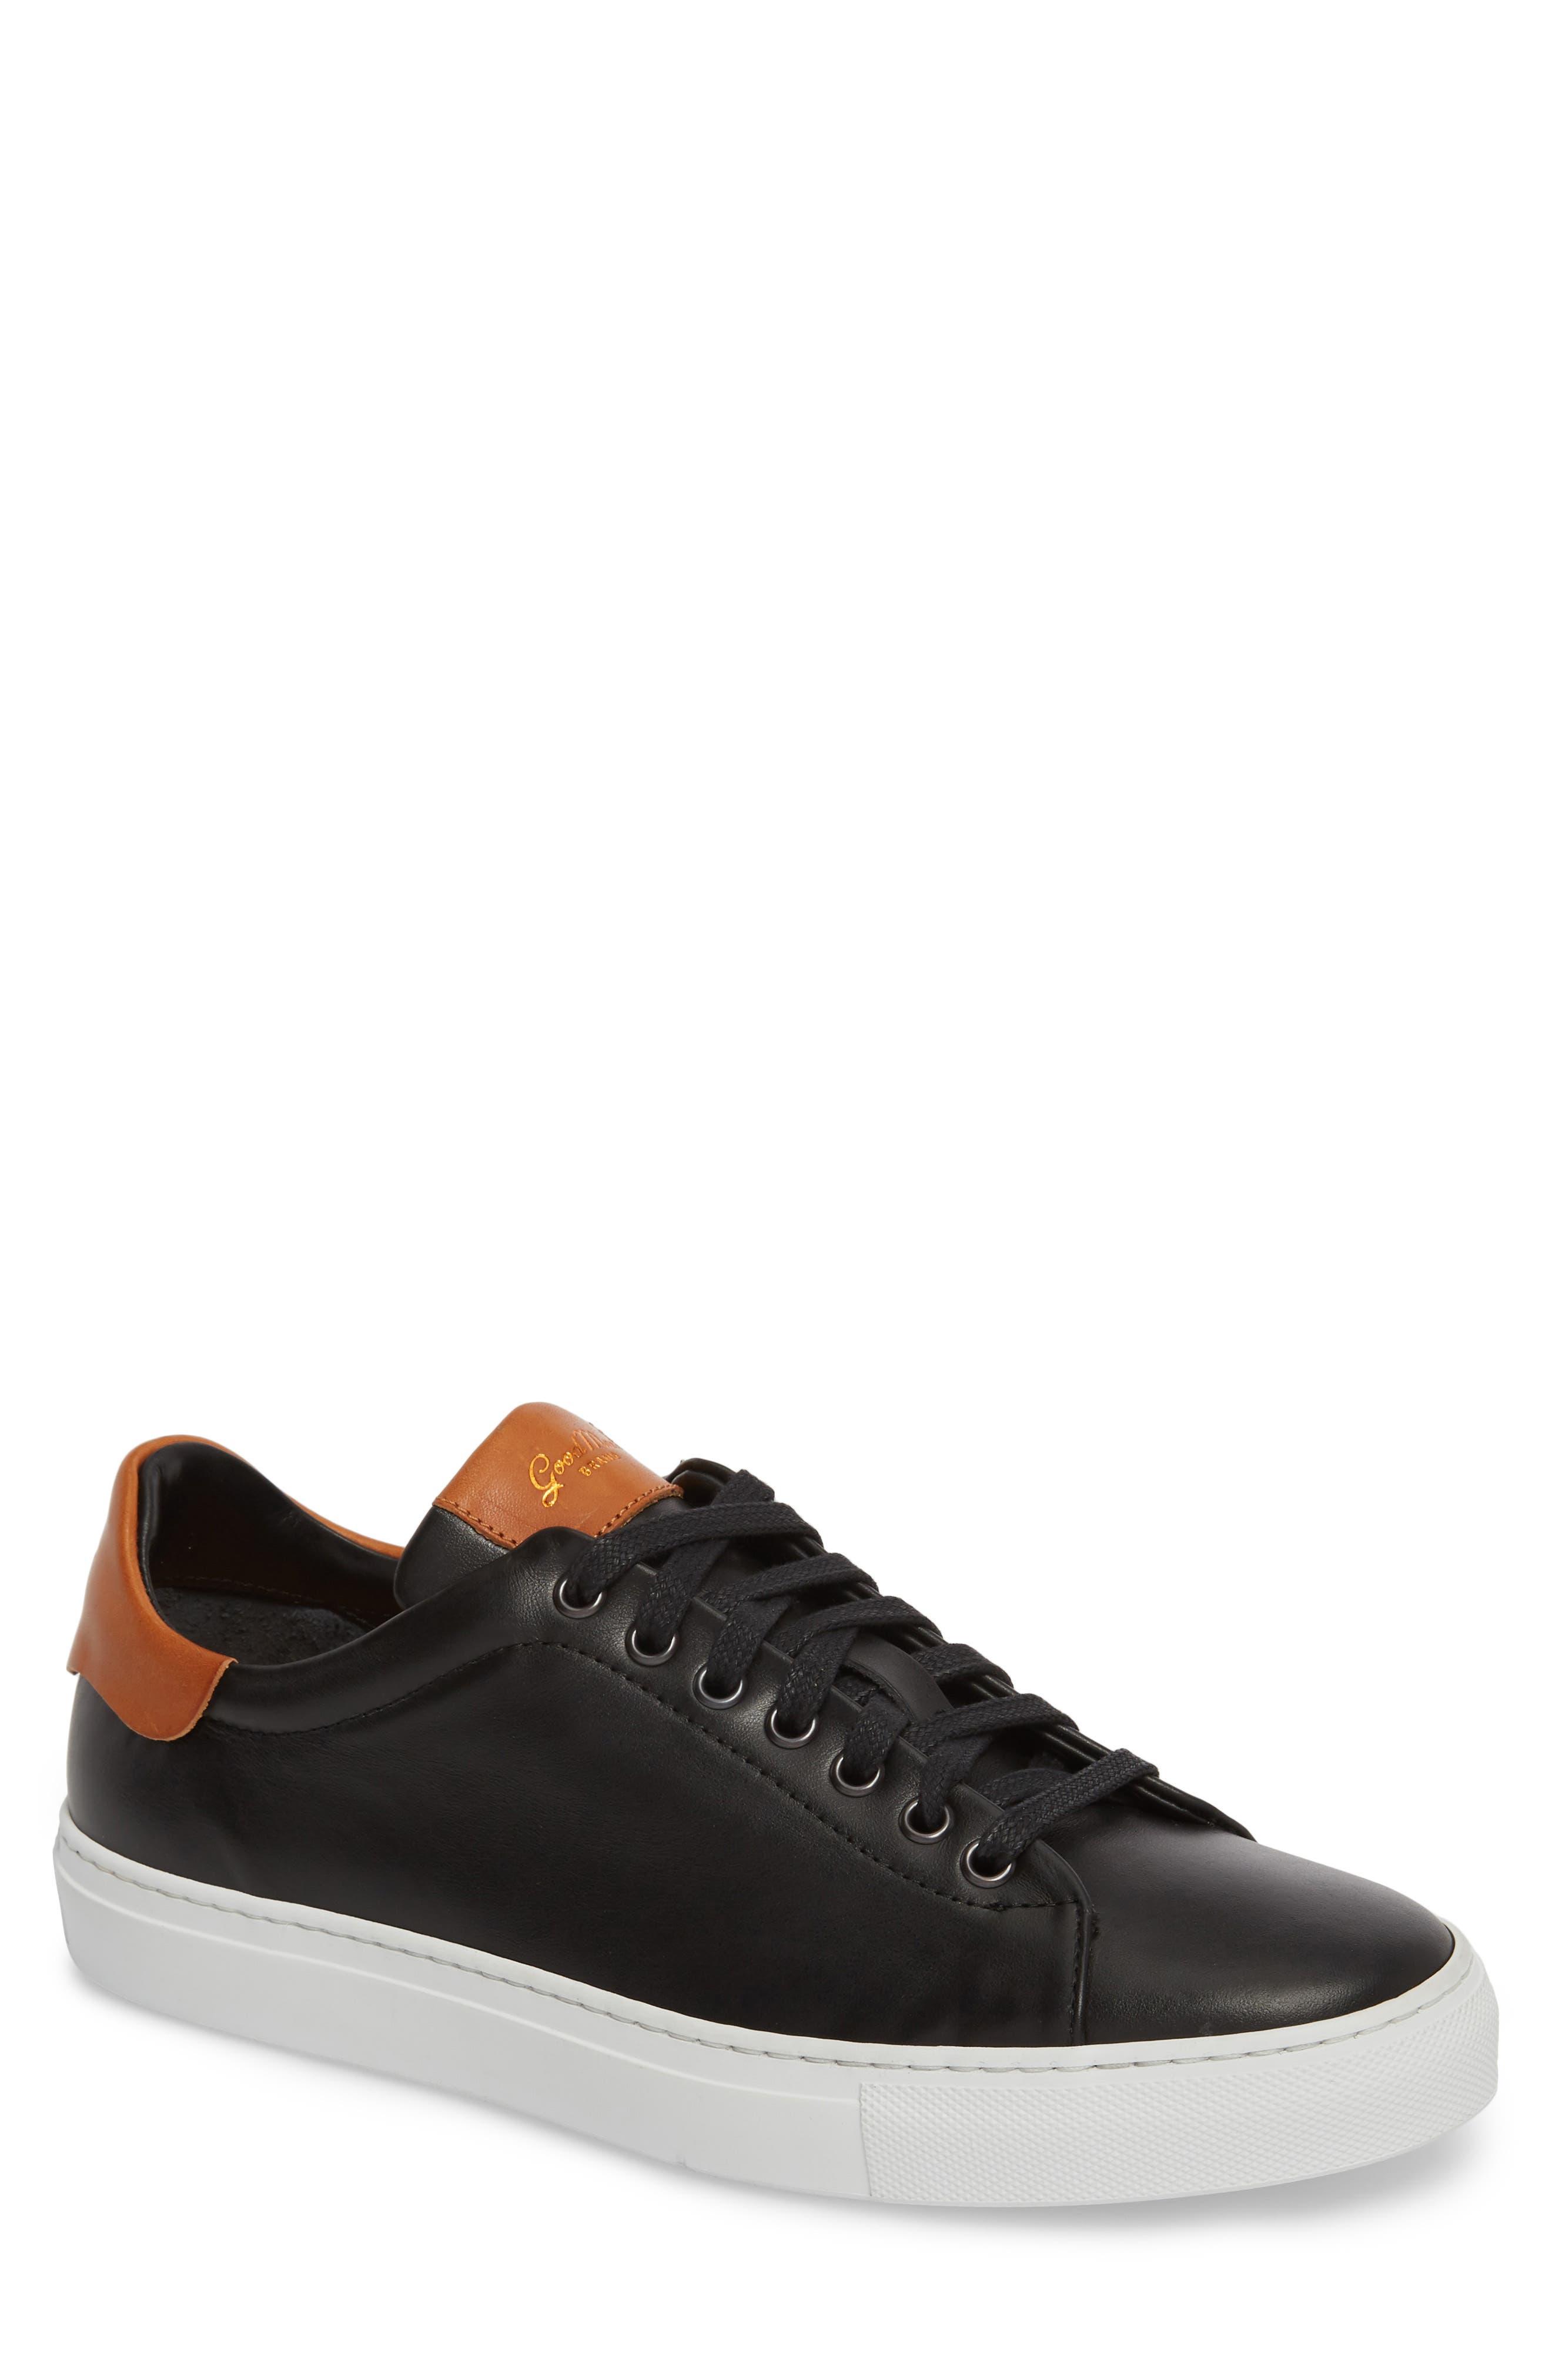 Legend Low Top Sneaker,                             Main thumbnail 1, color,                             BLACK/ VACHETTA LEATHER